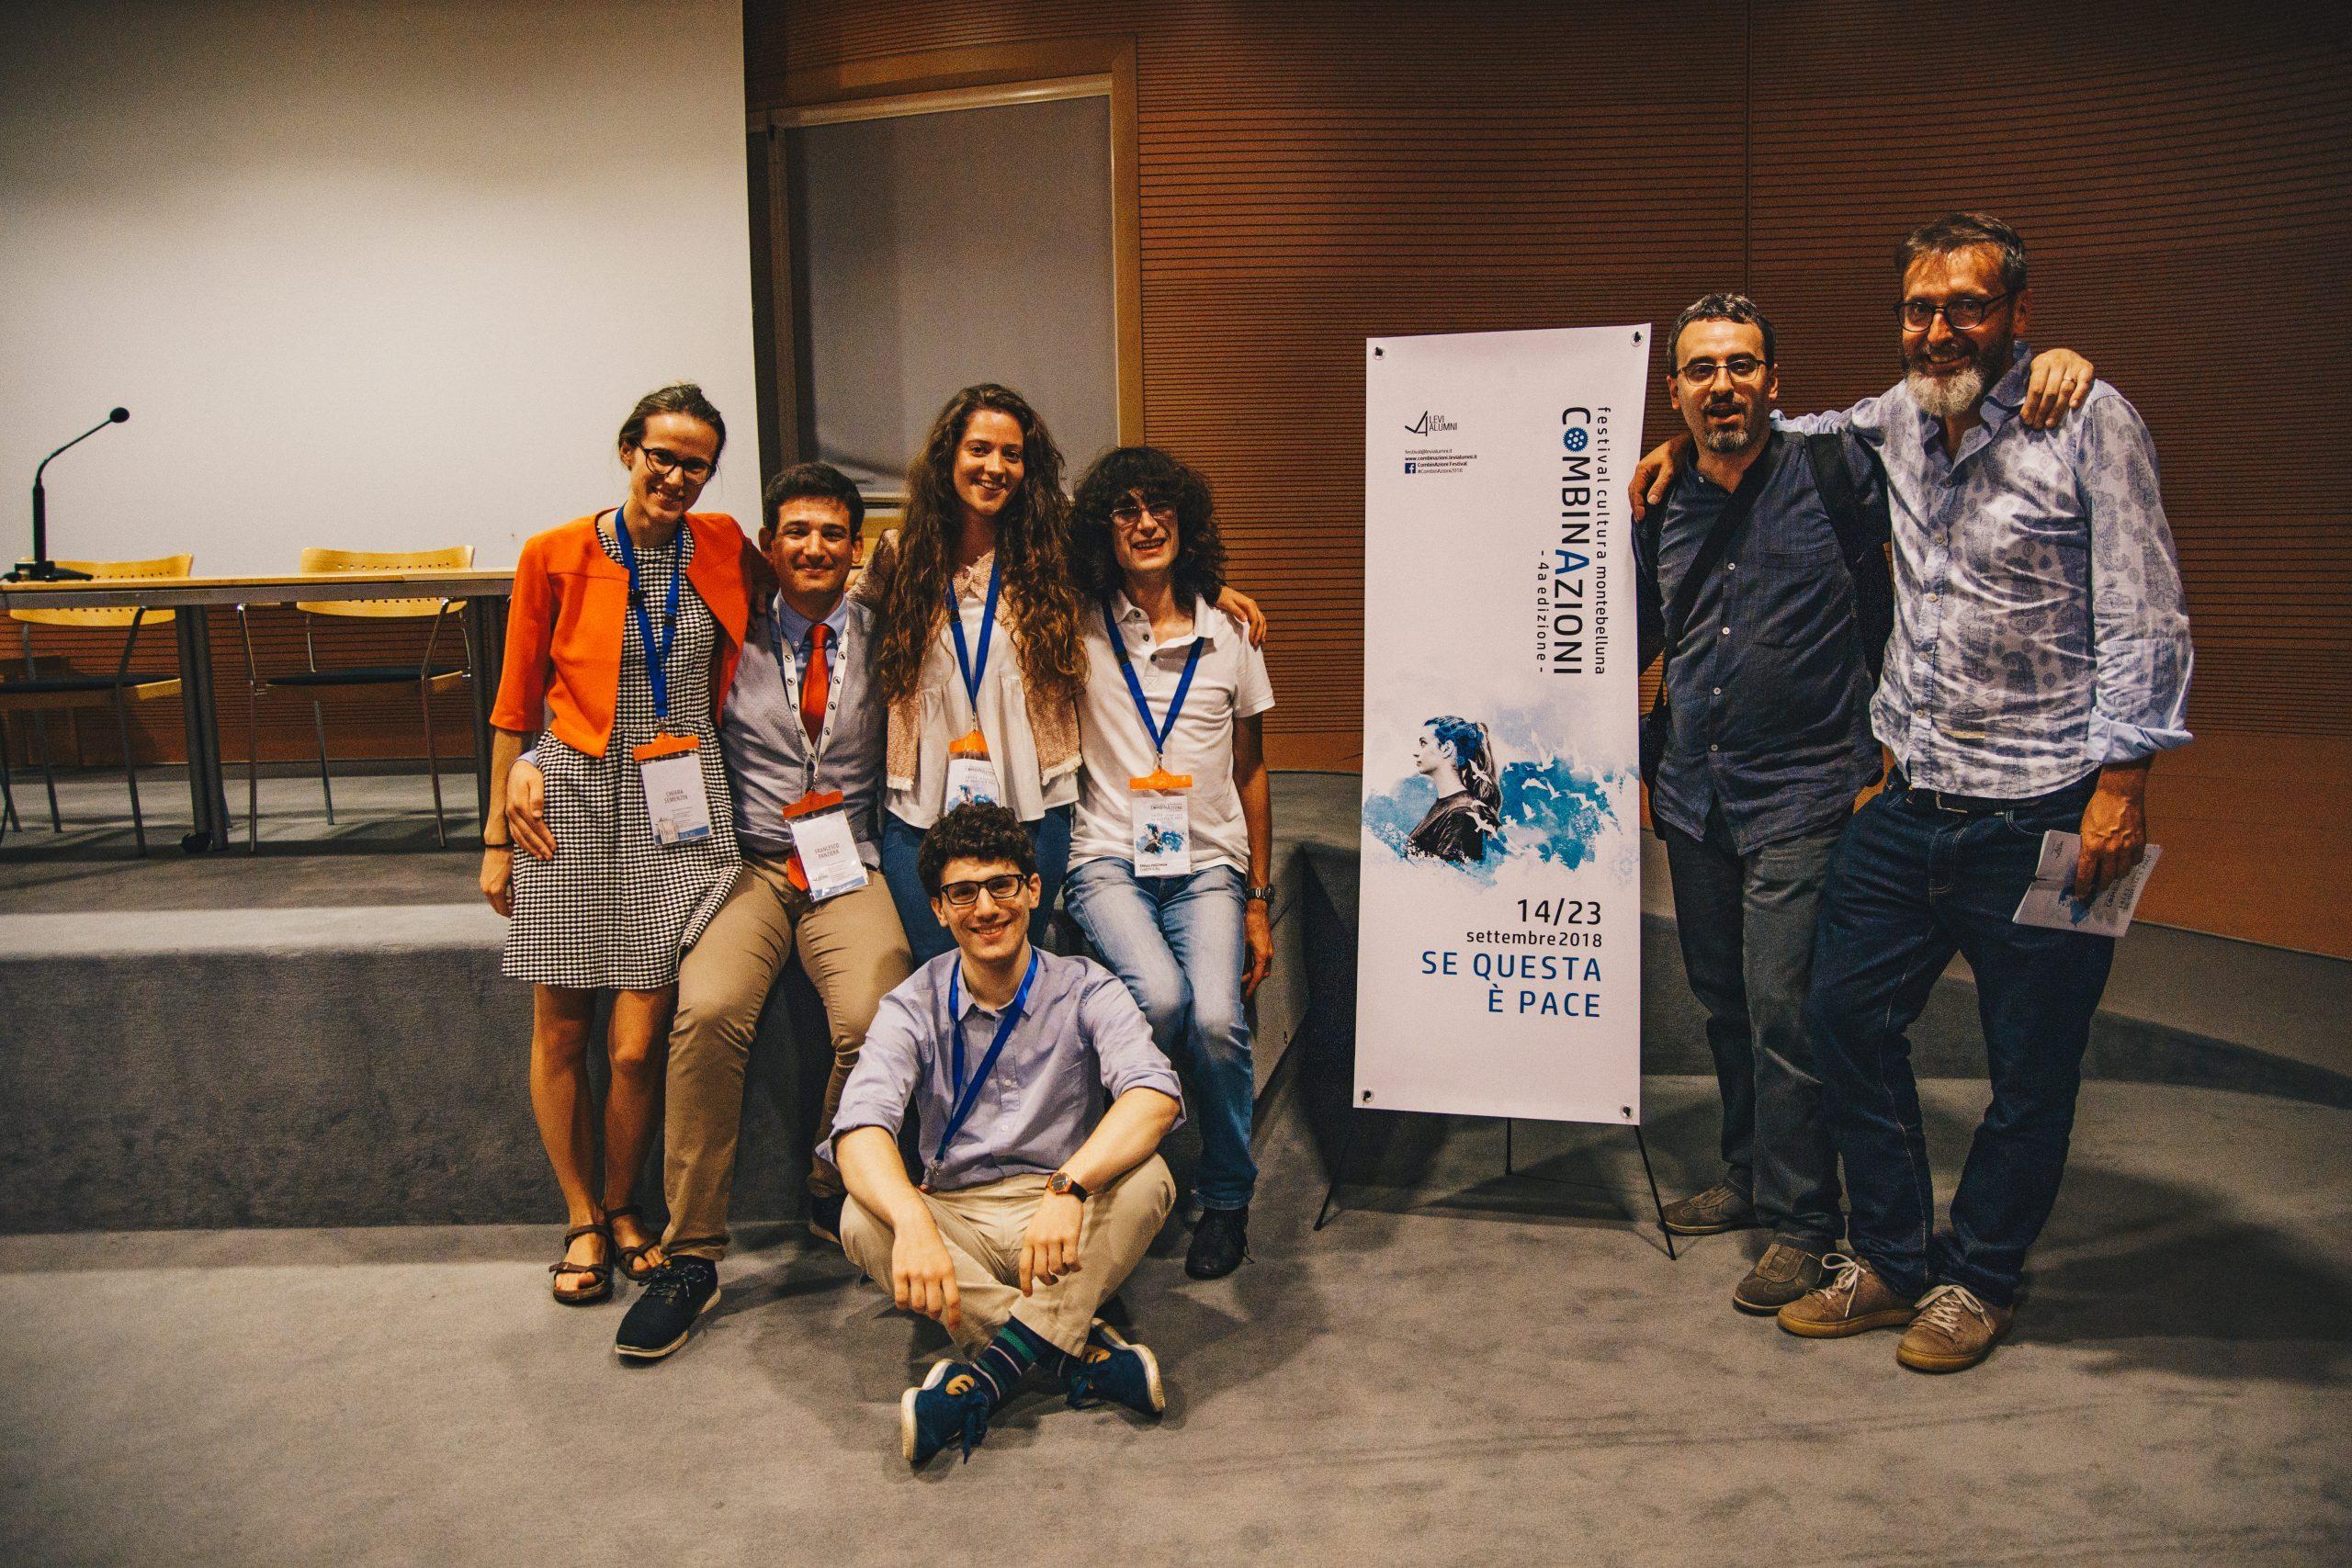 https://combinazionifestival.it/wp-content/uploads/2020/08/20180921_combinAzioni_Vignarca_LeonardoDeAzevedo_19-scaled-1-2560x1707.jpg